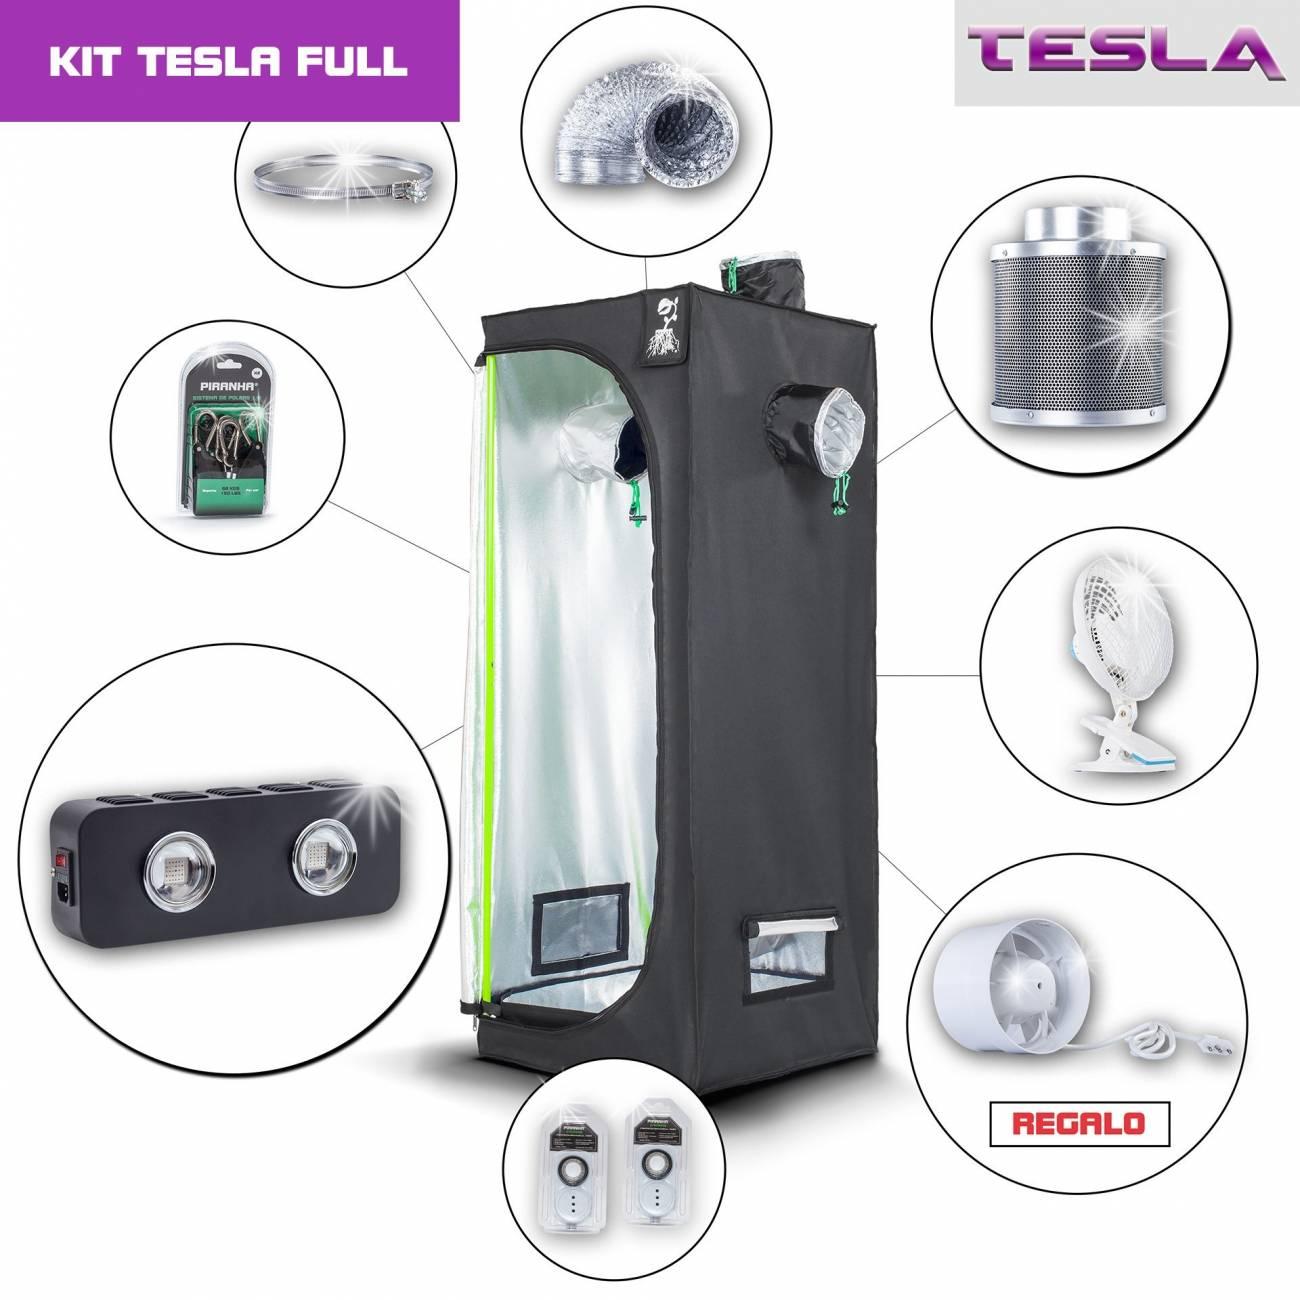 Kit Tesla 60 - T180W Completo